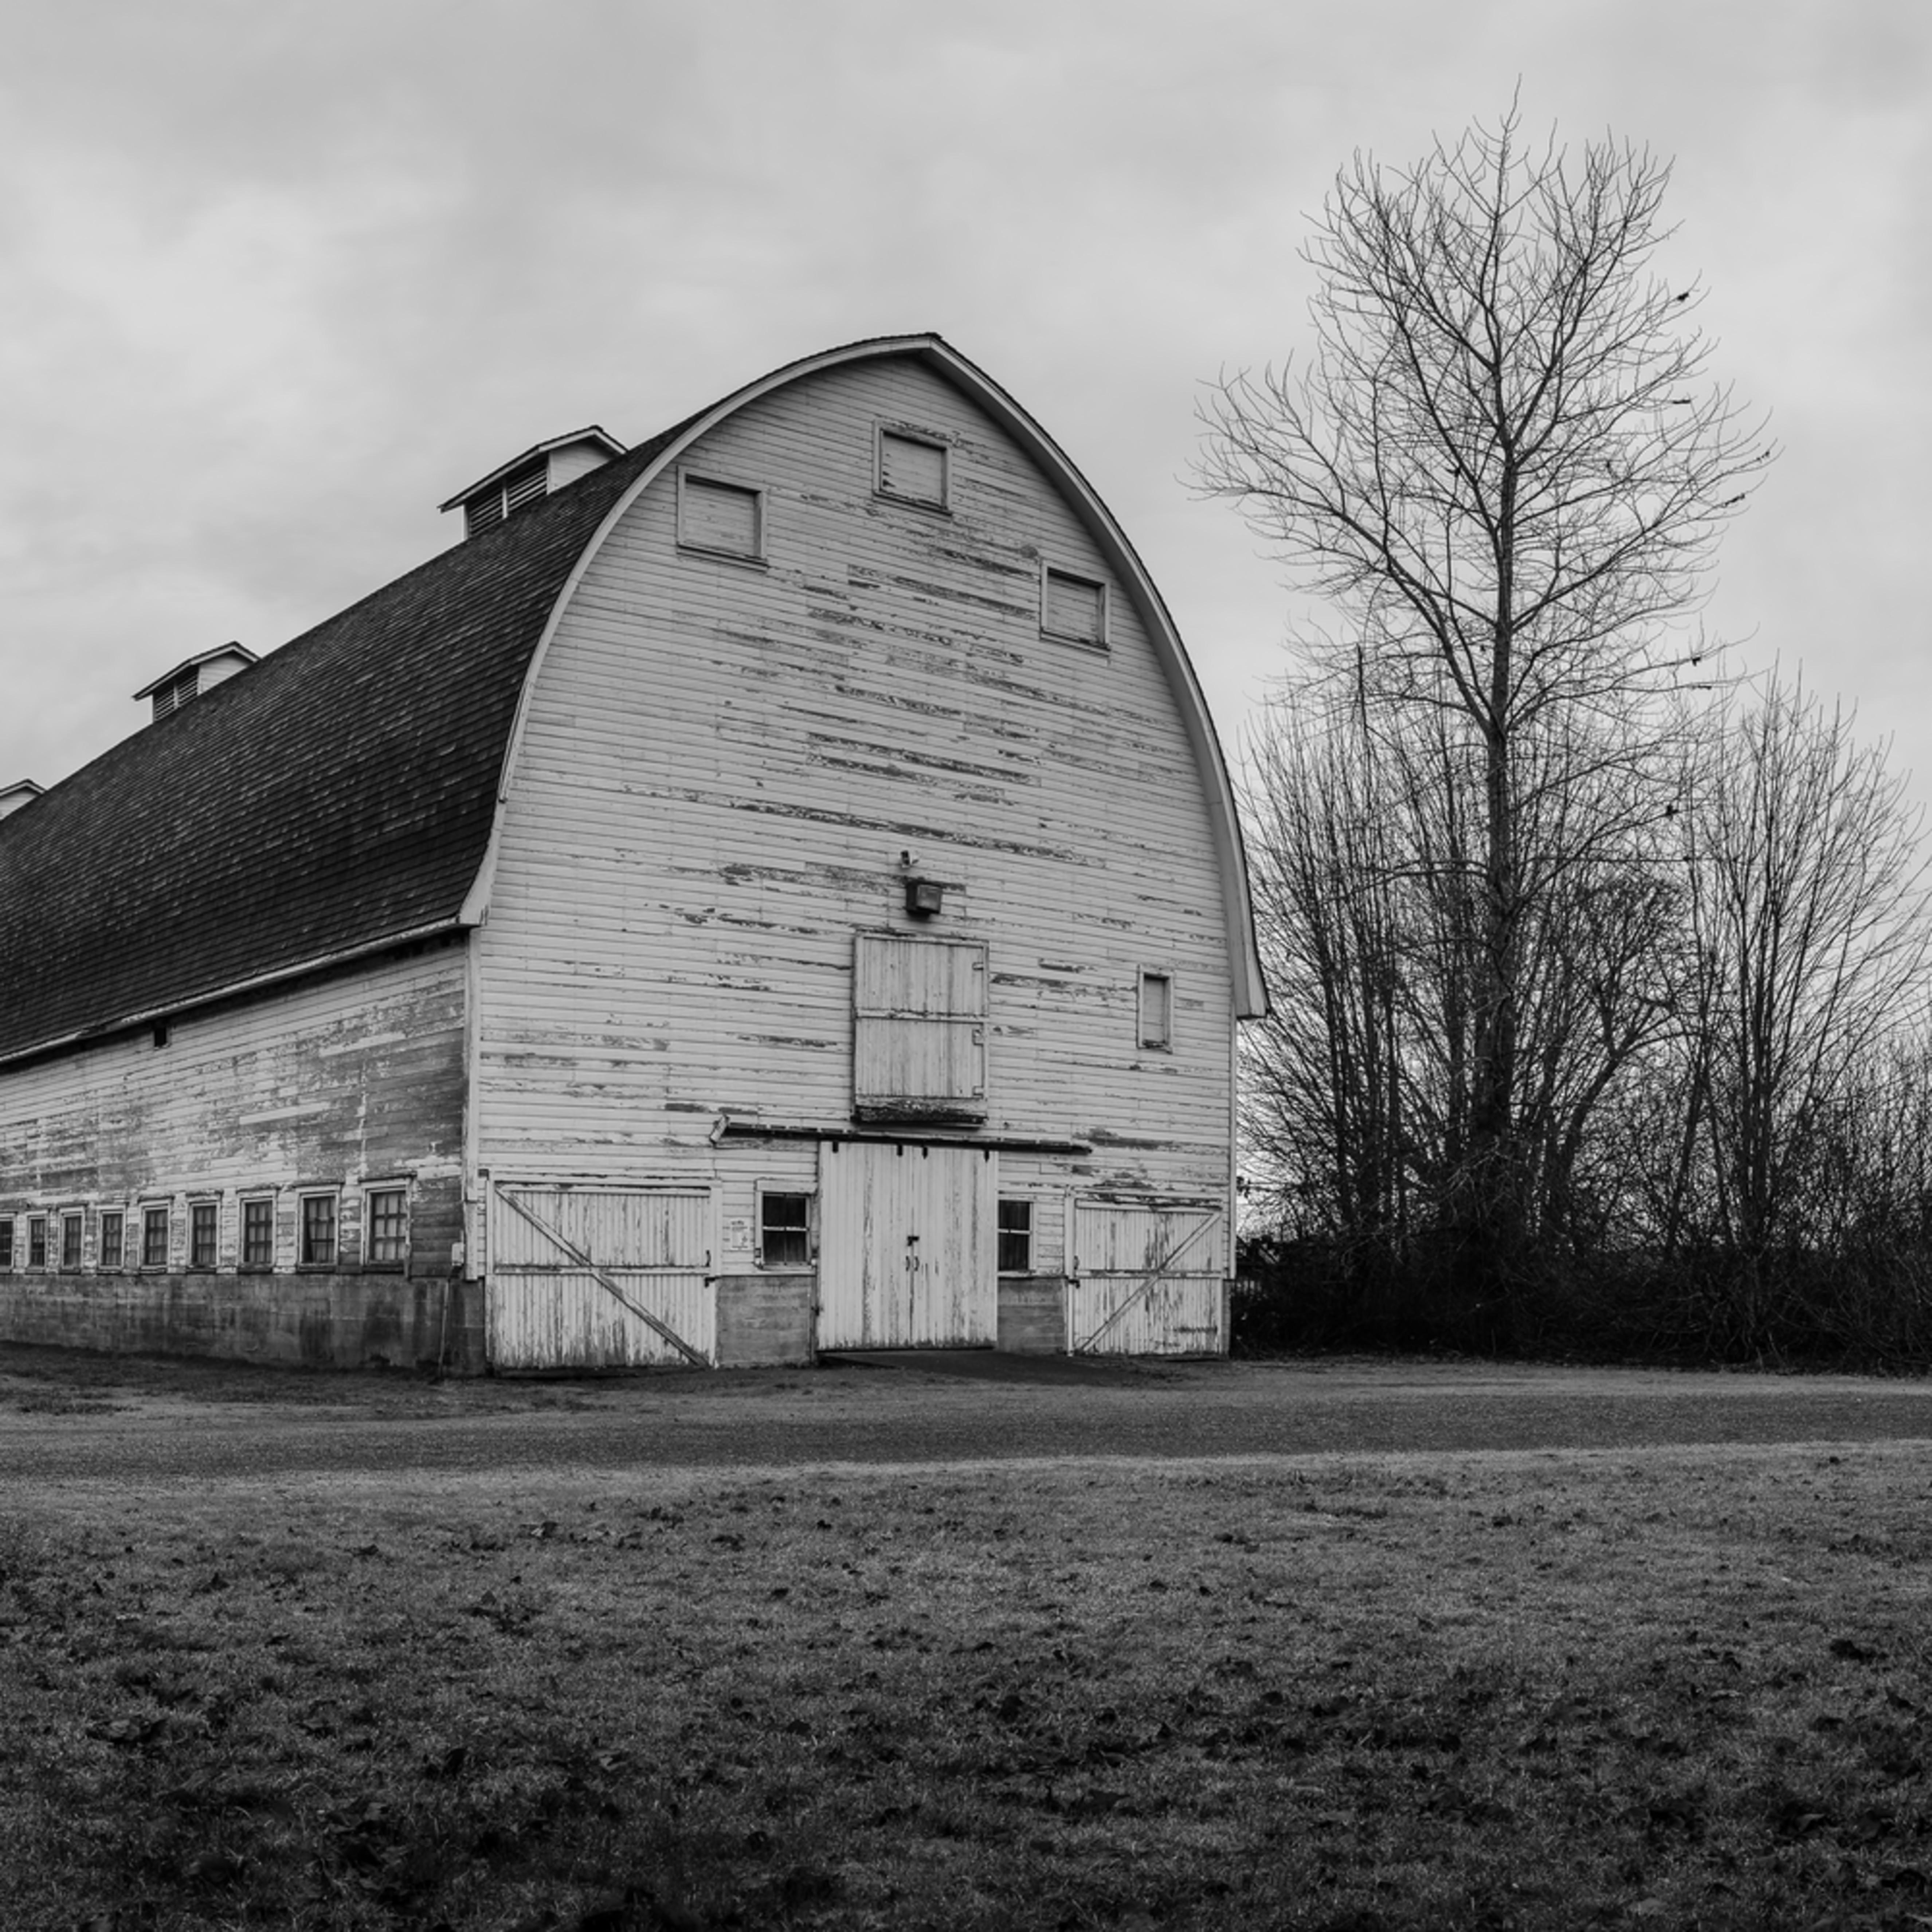 Old barn nisqually washington 2016 cidnbv